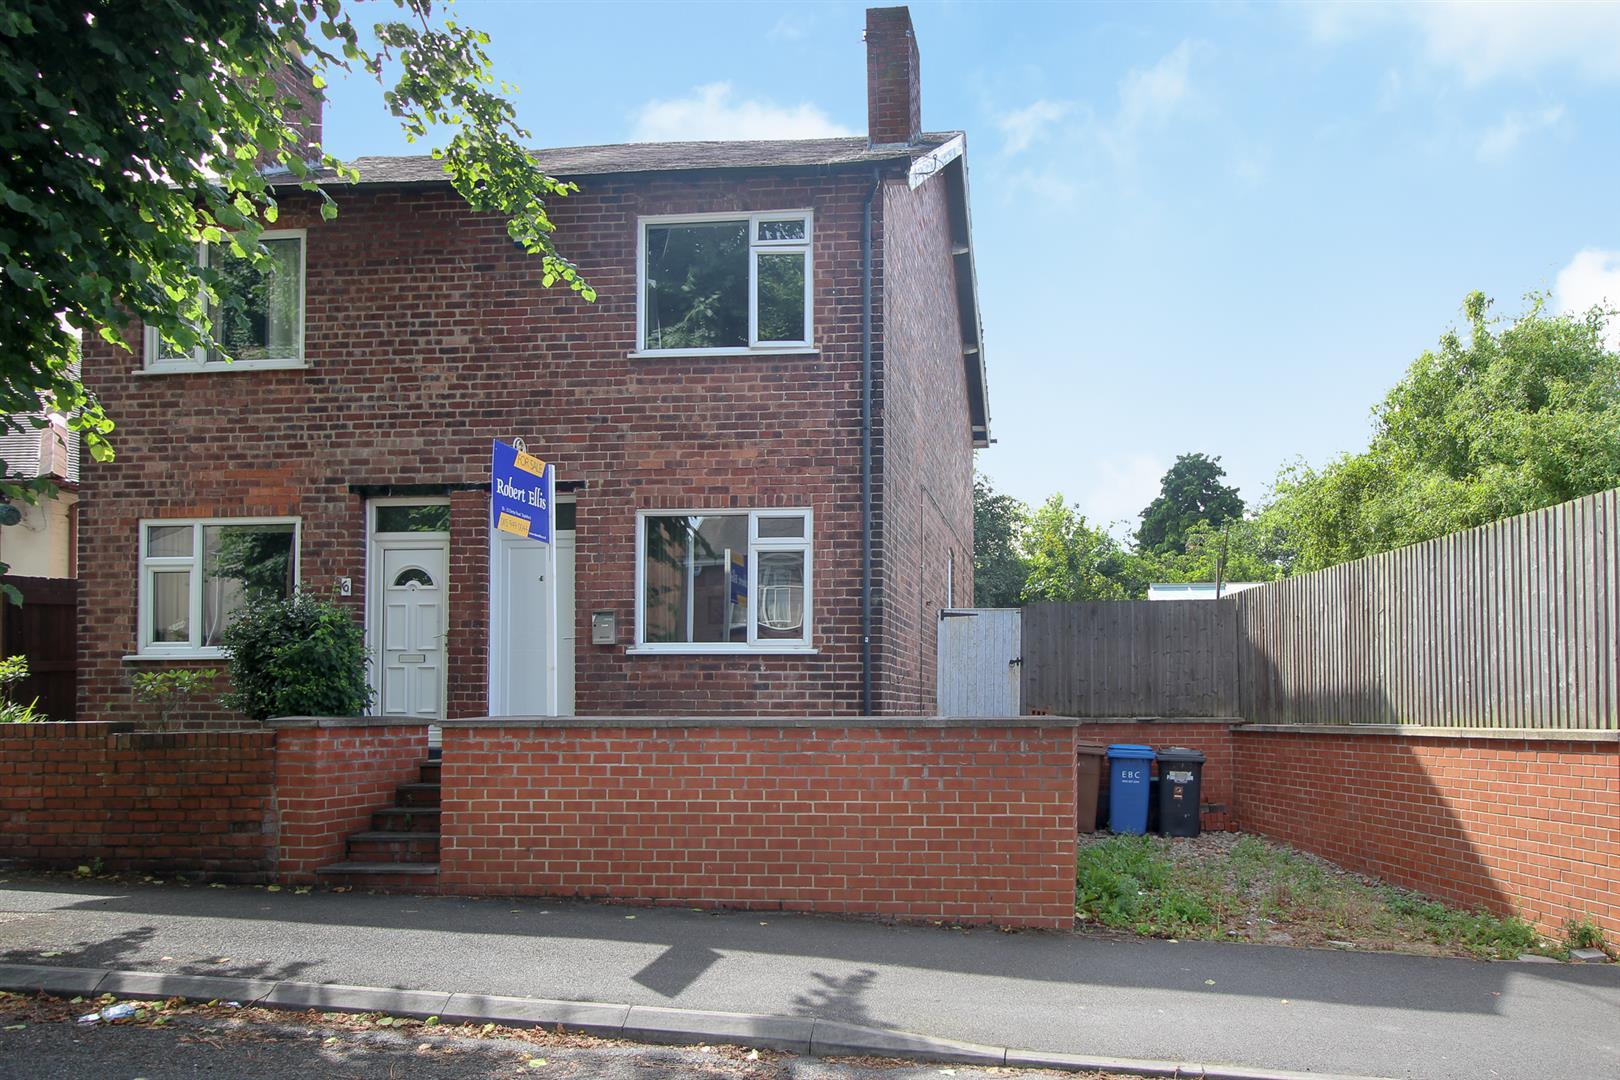 2 Bedrooms Semi Detached House for sale in Kingsway, Ilkeston